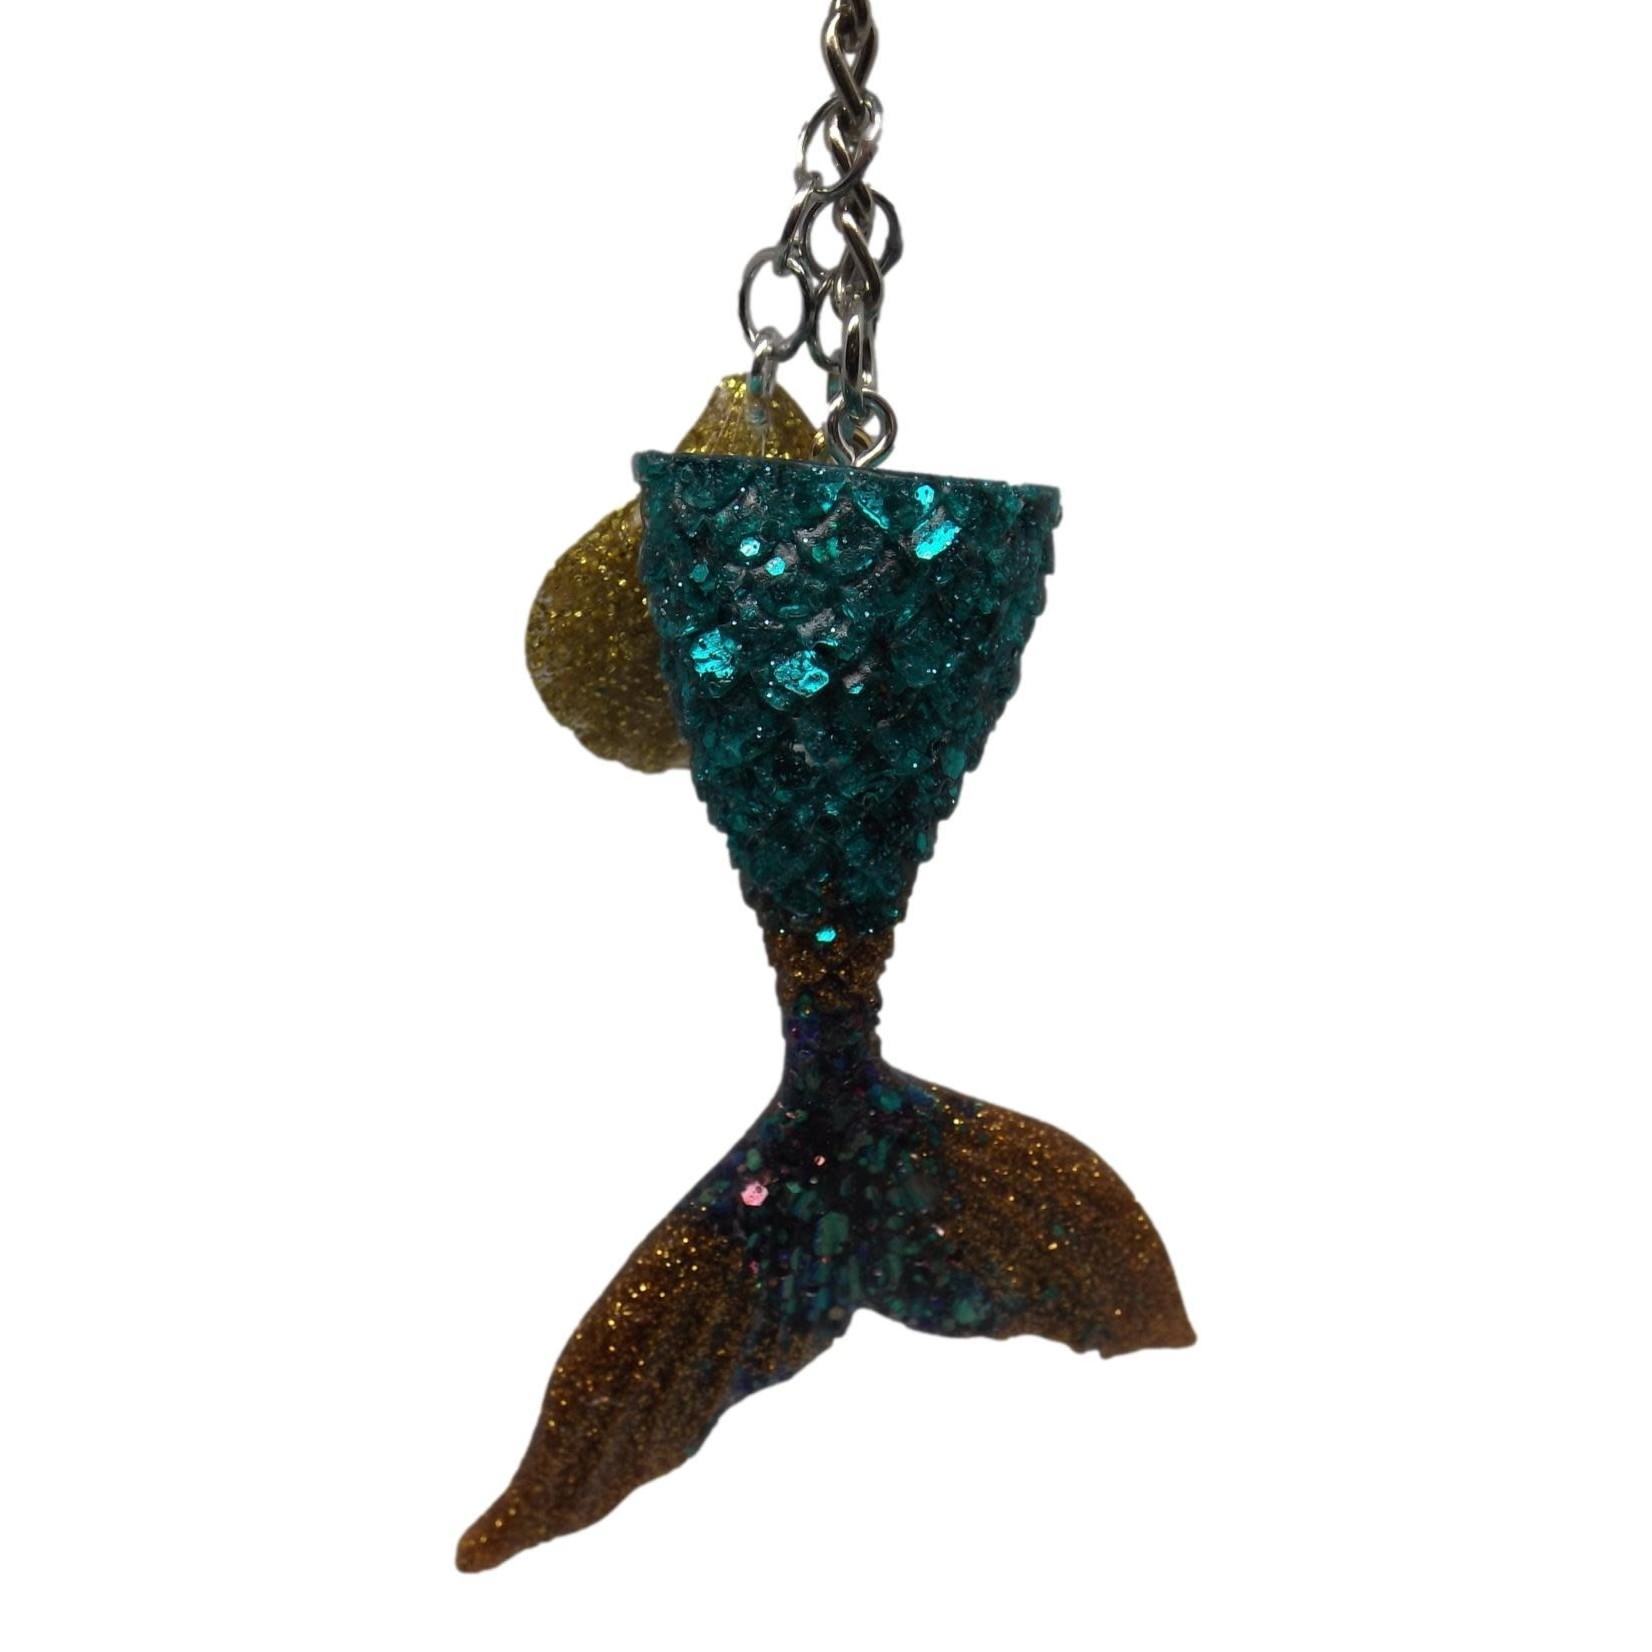 East Coast Sirens Loads of Glitter Mermaid Tail Keychain